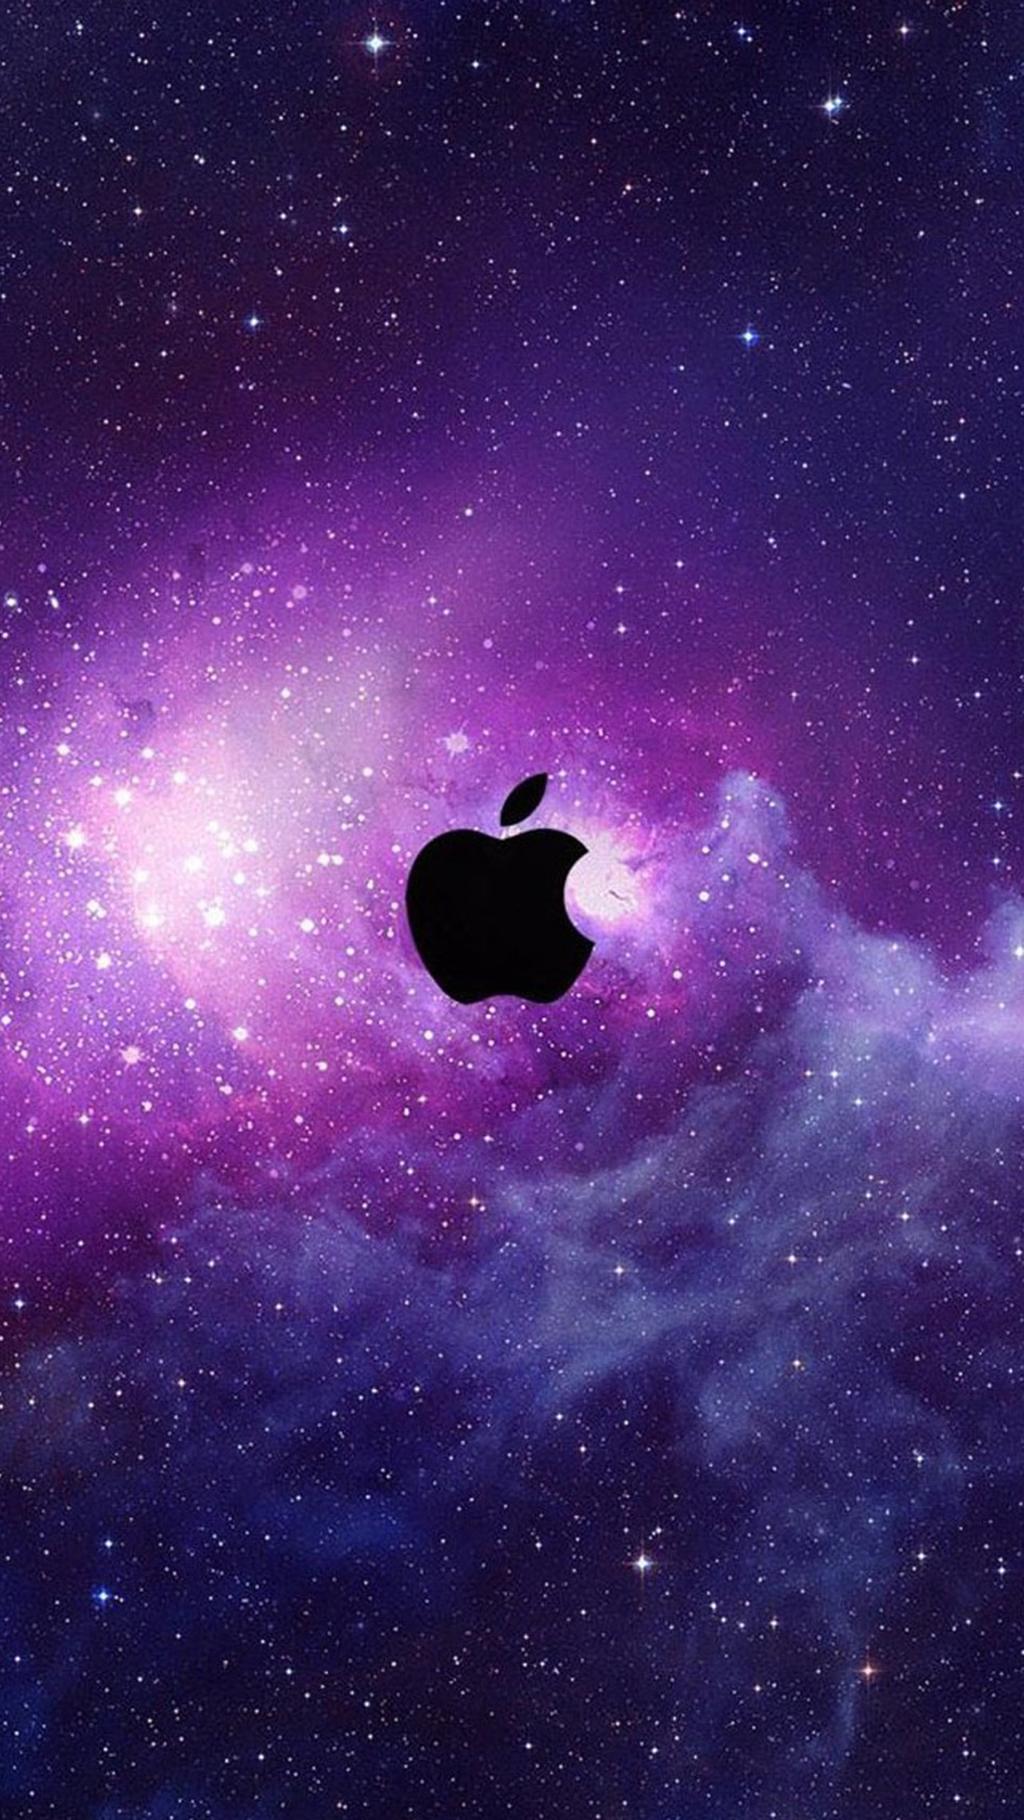 Wallpaper Weekends: Deep Space iPhone Wallpapers